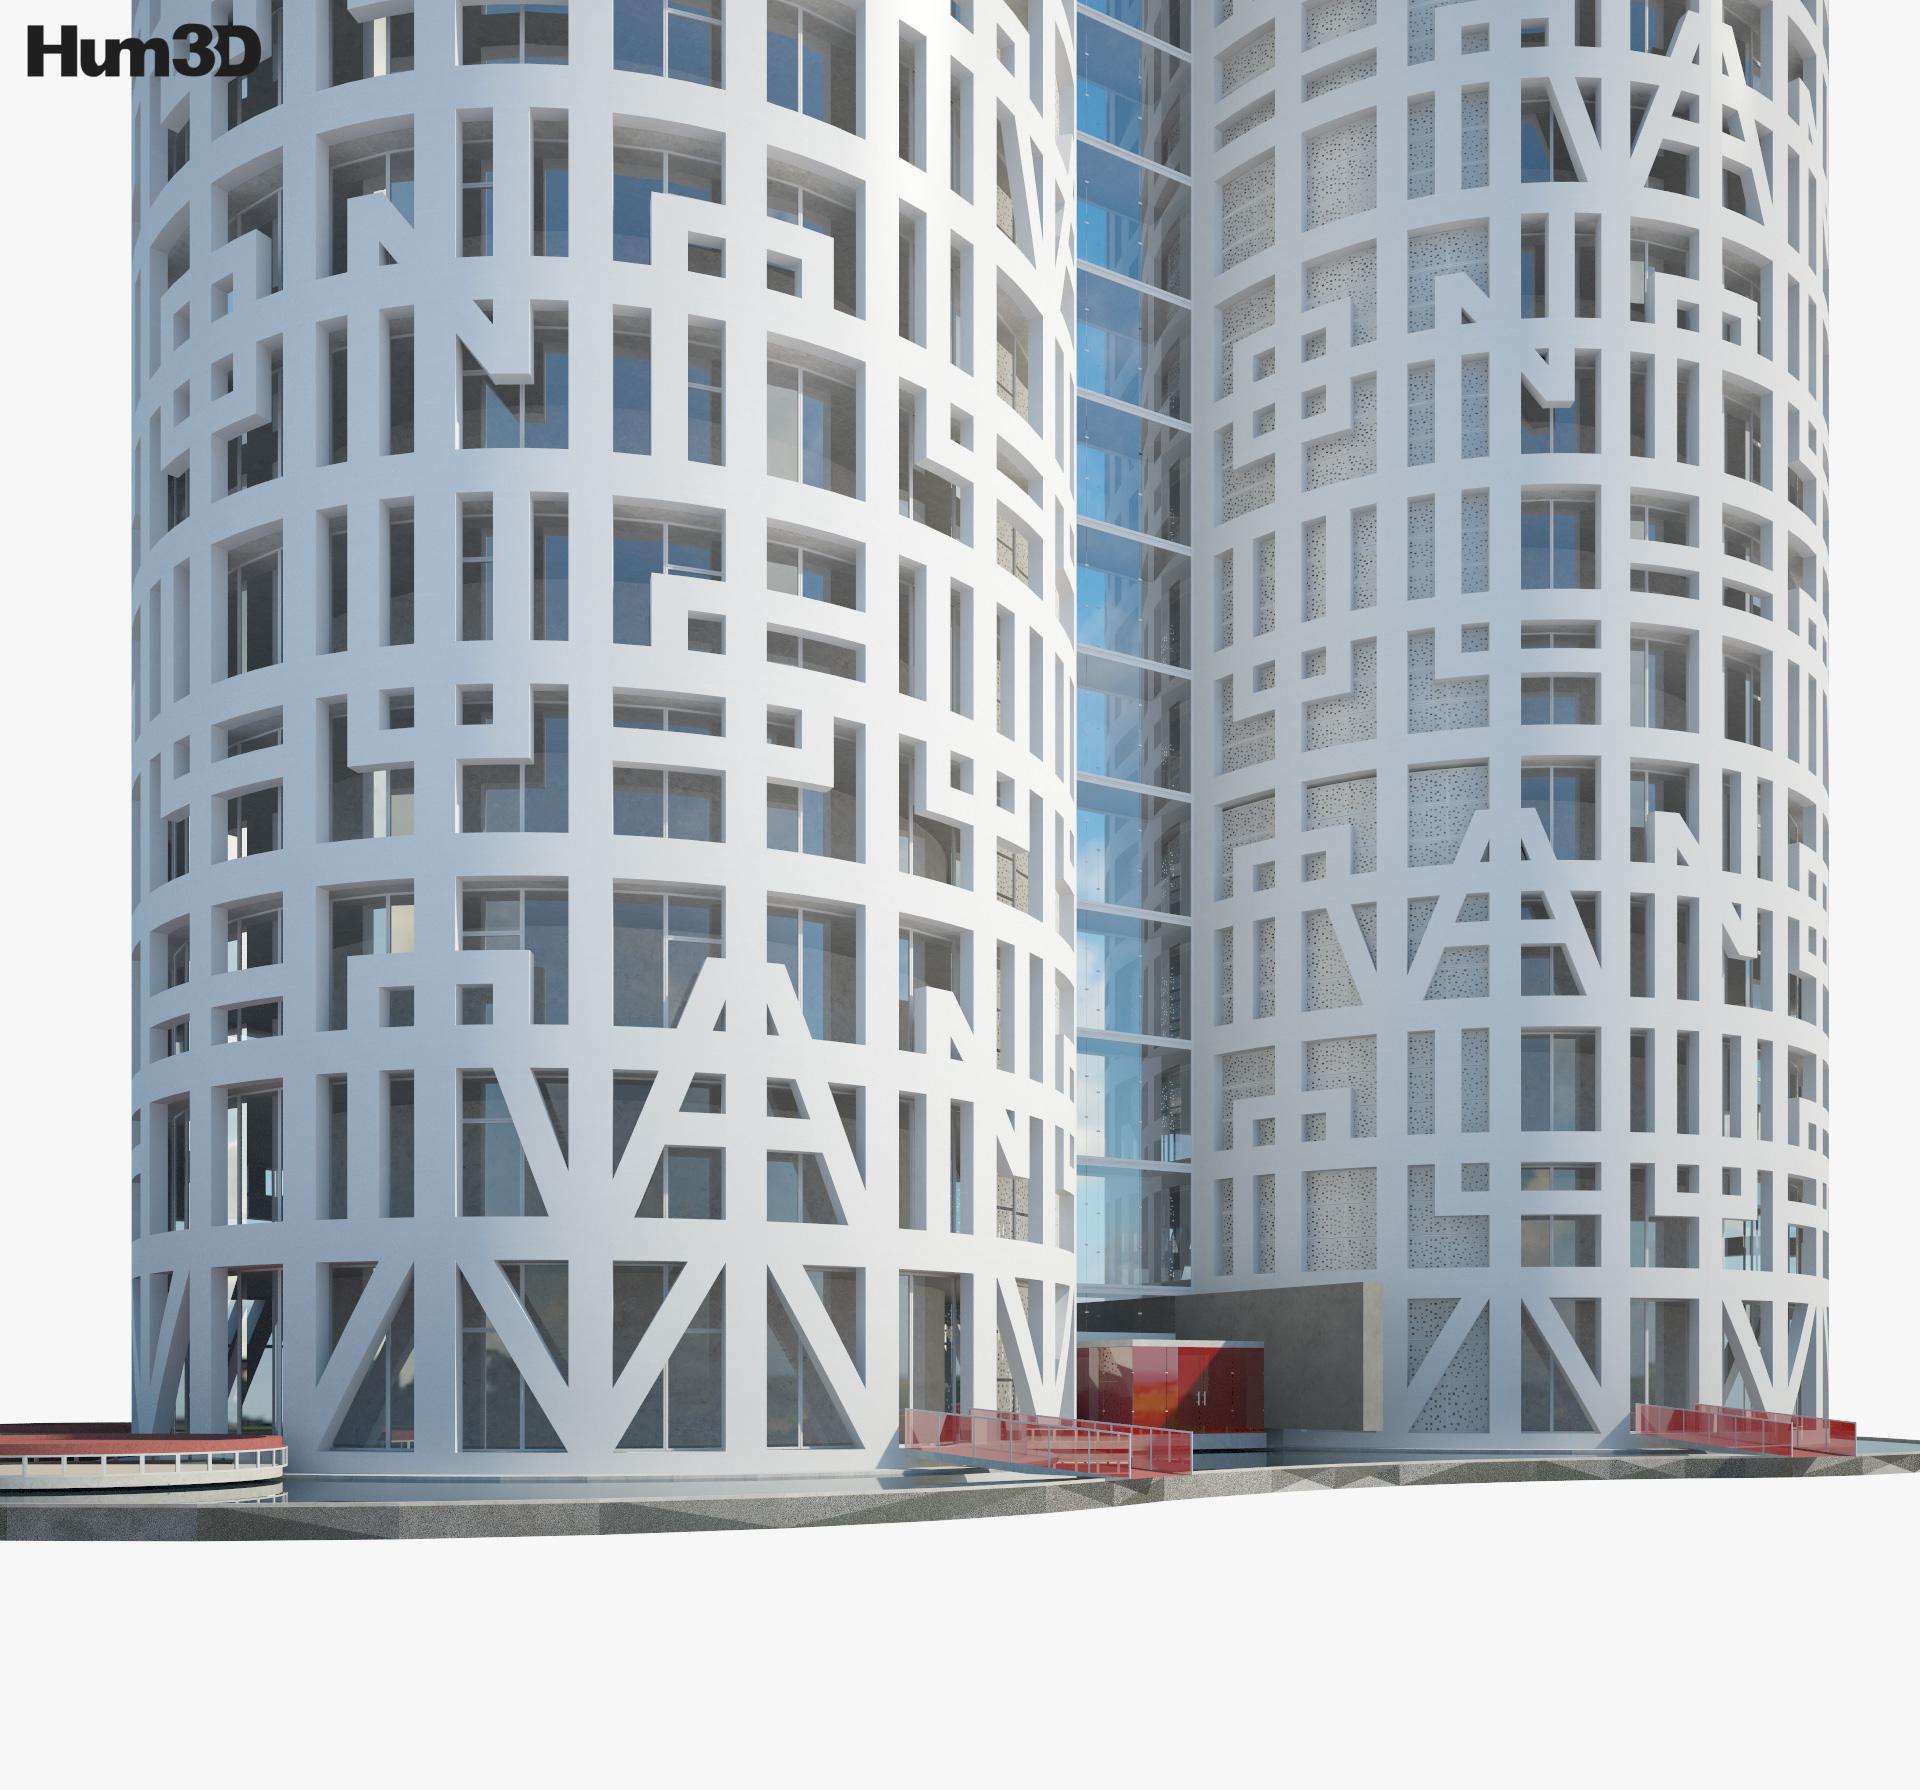 Torres de Hercules 3d model